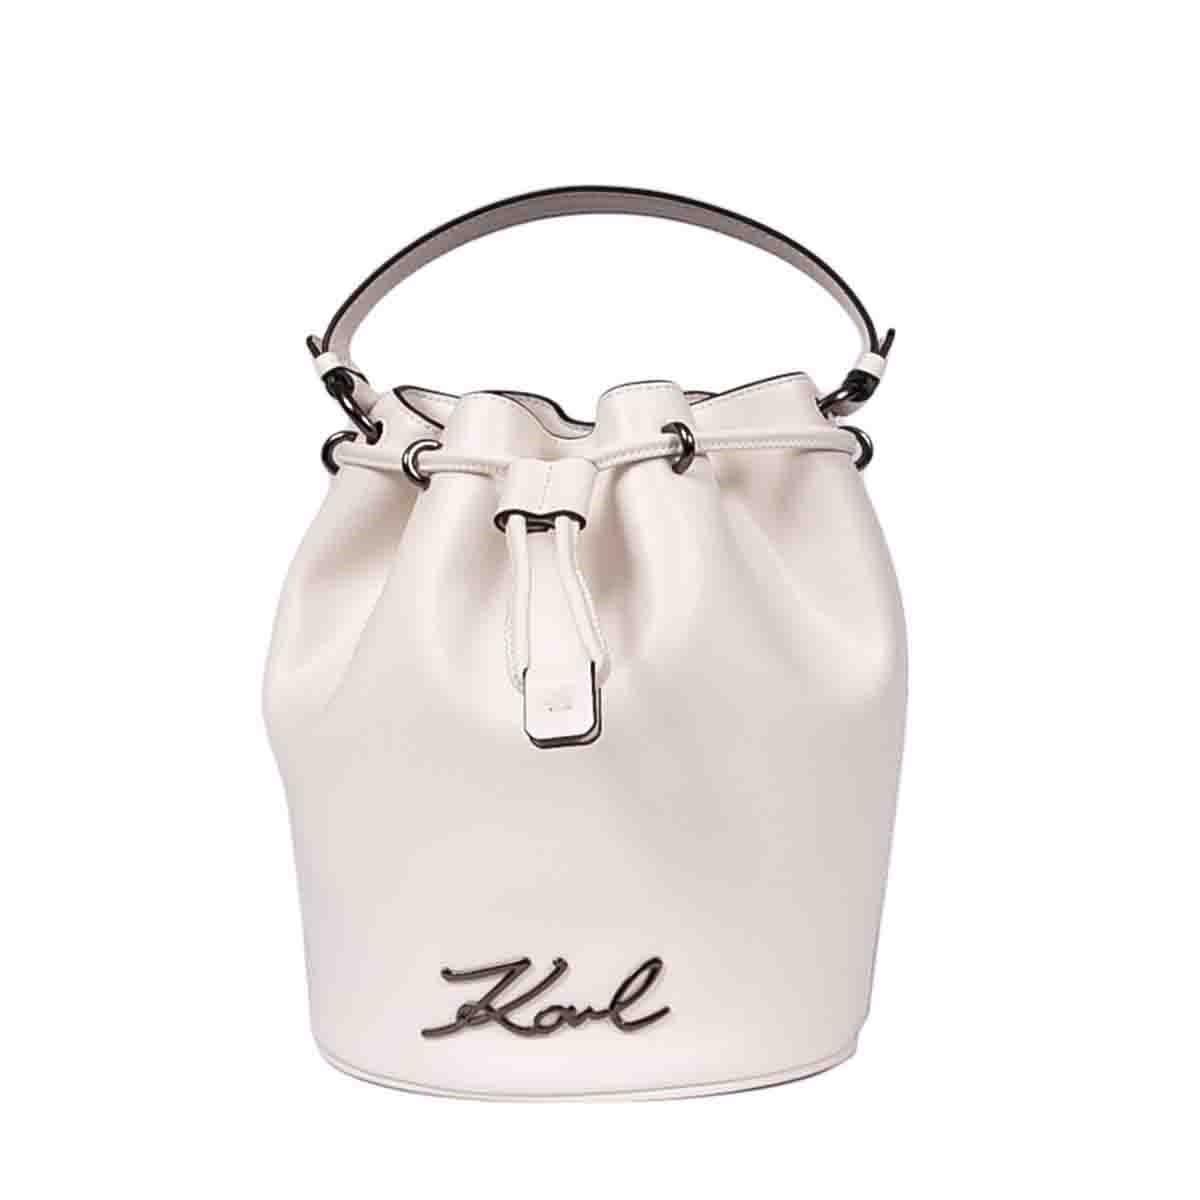 Karl Lagerfeld Bags K/SIGNATURE BUCKET BAG